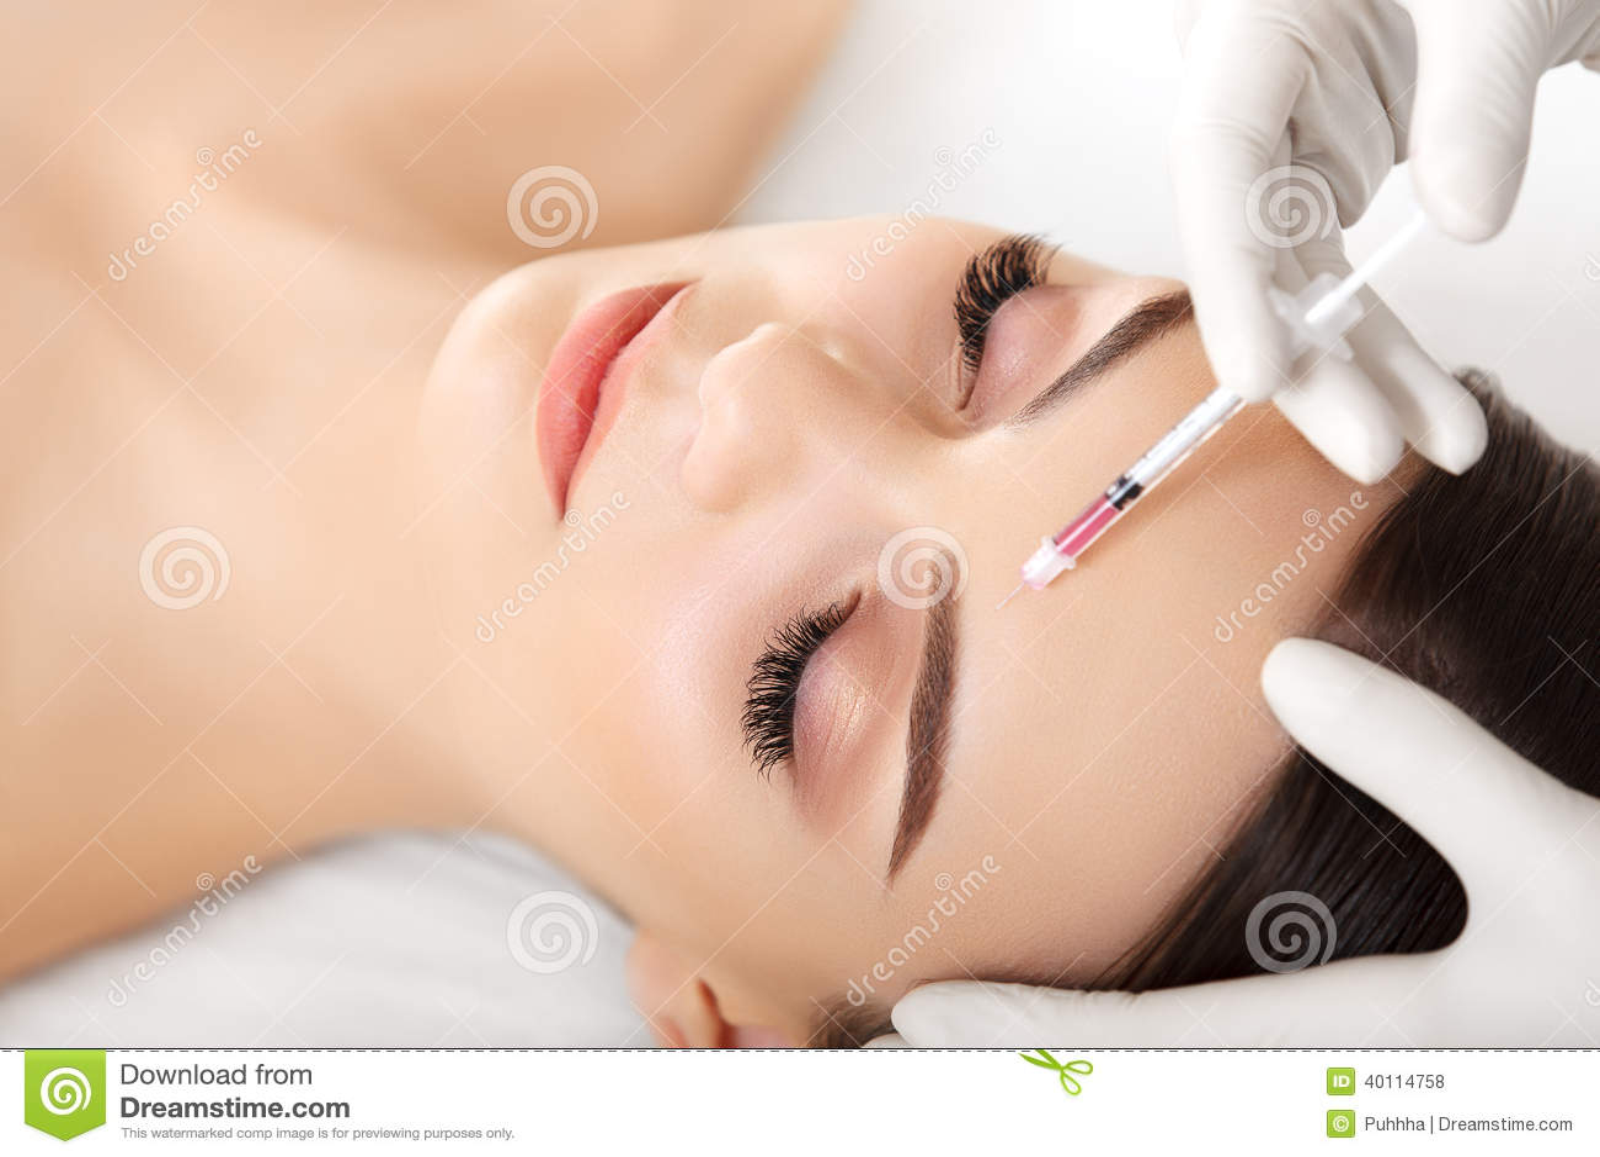 Cosmetology license transfer to georgia